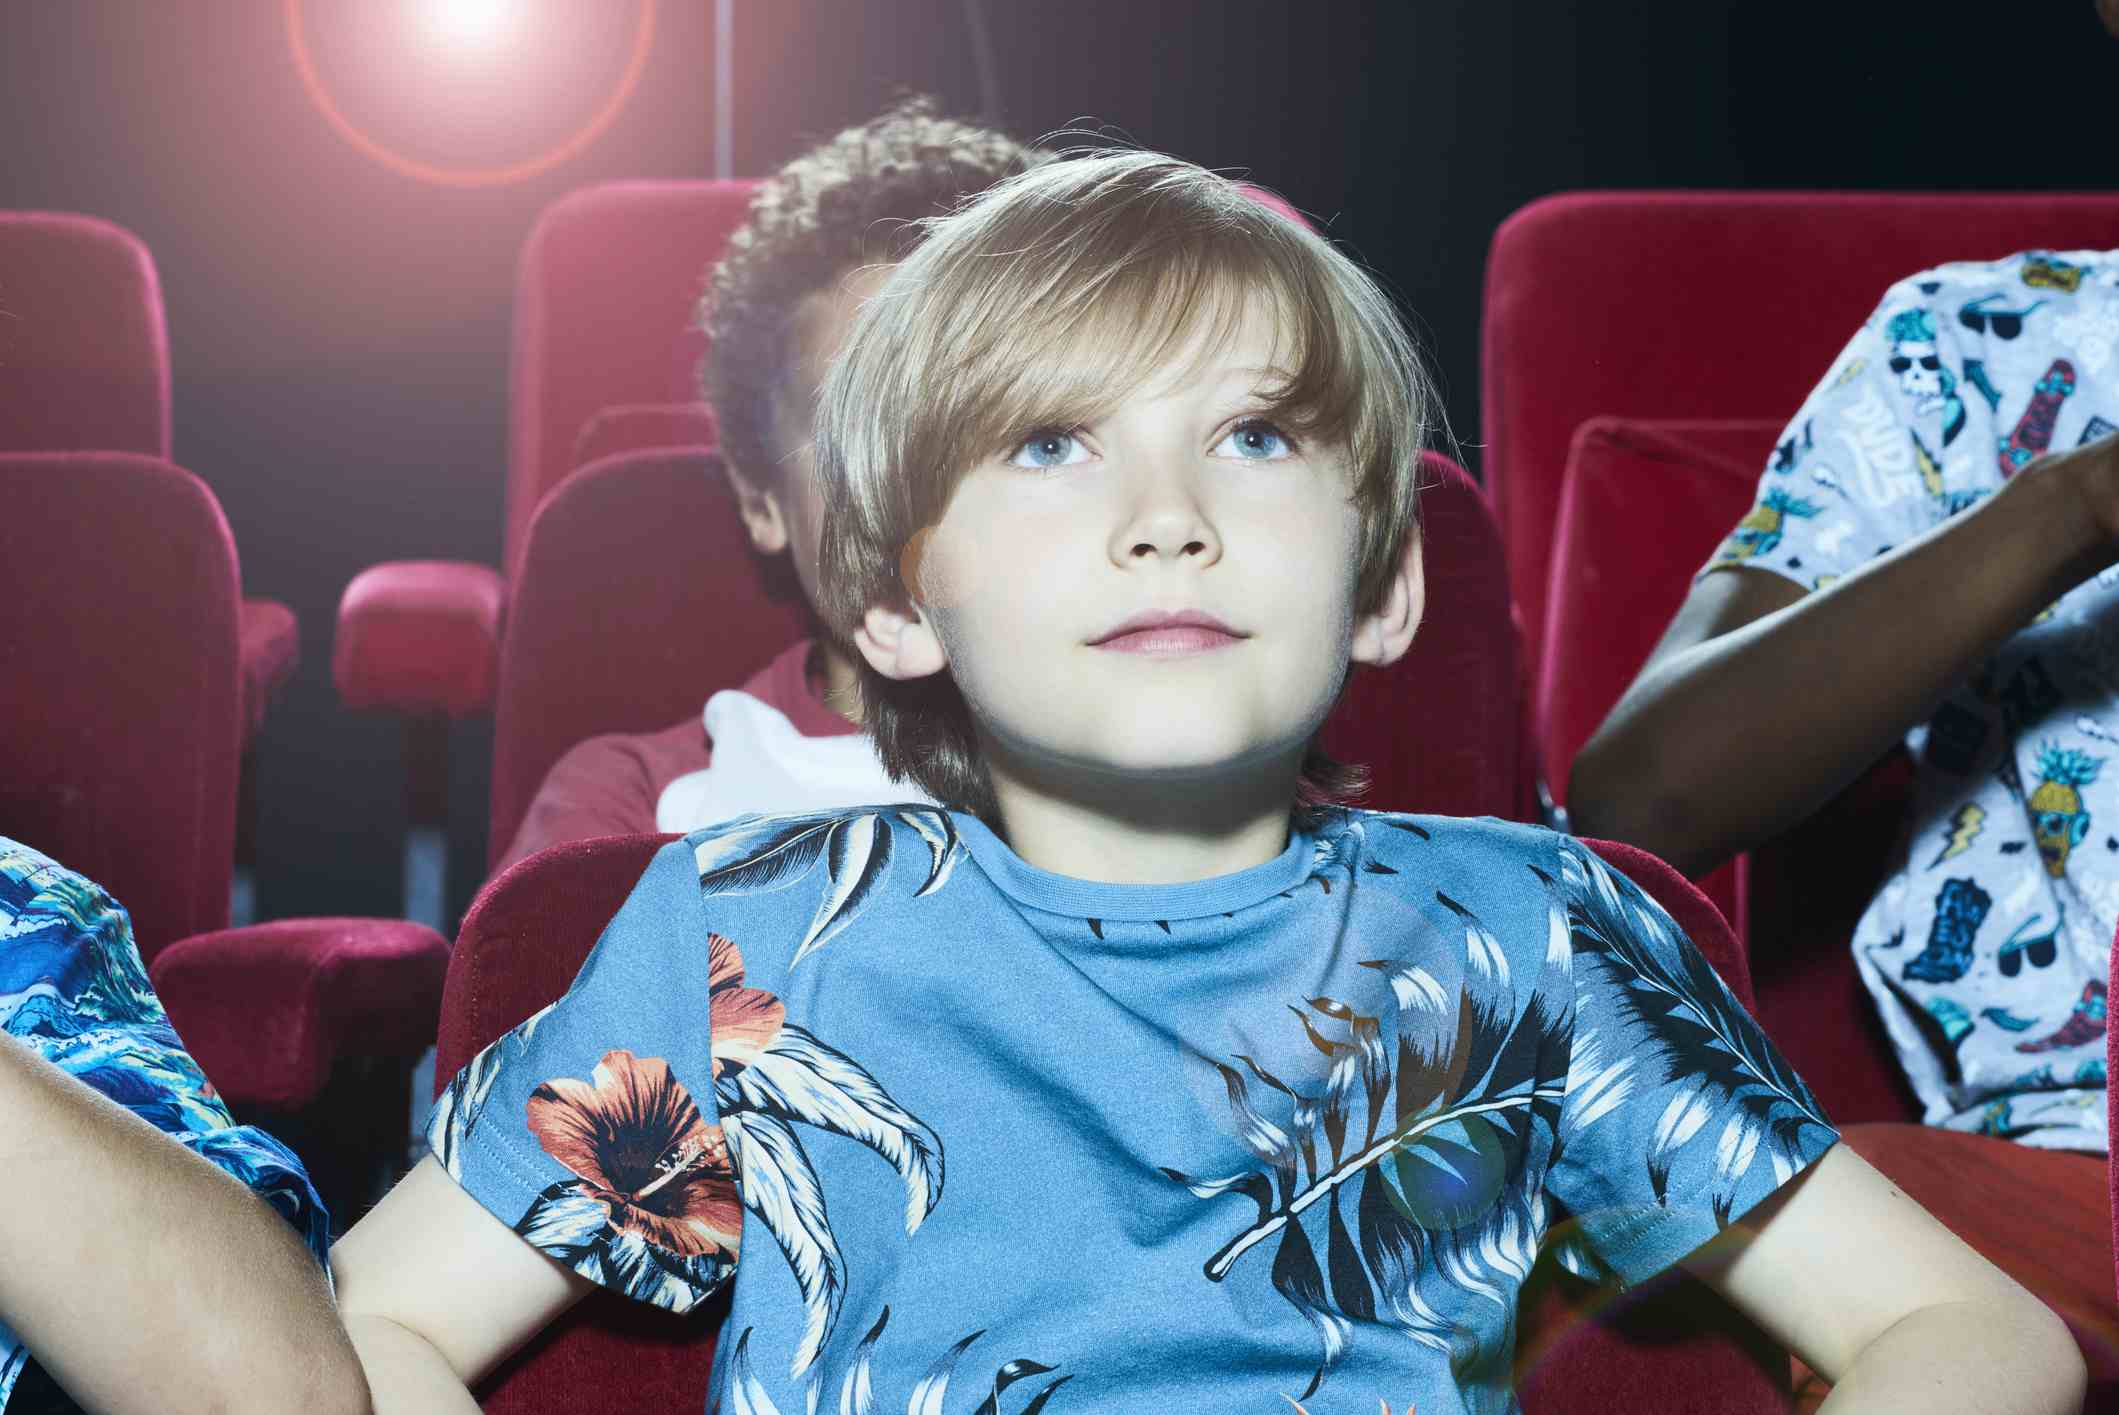 Boy Watching a Movie